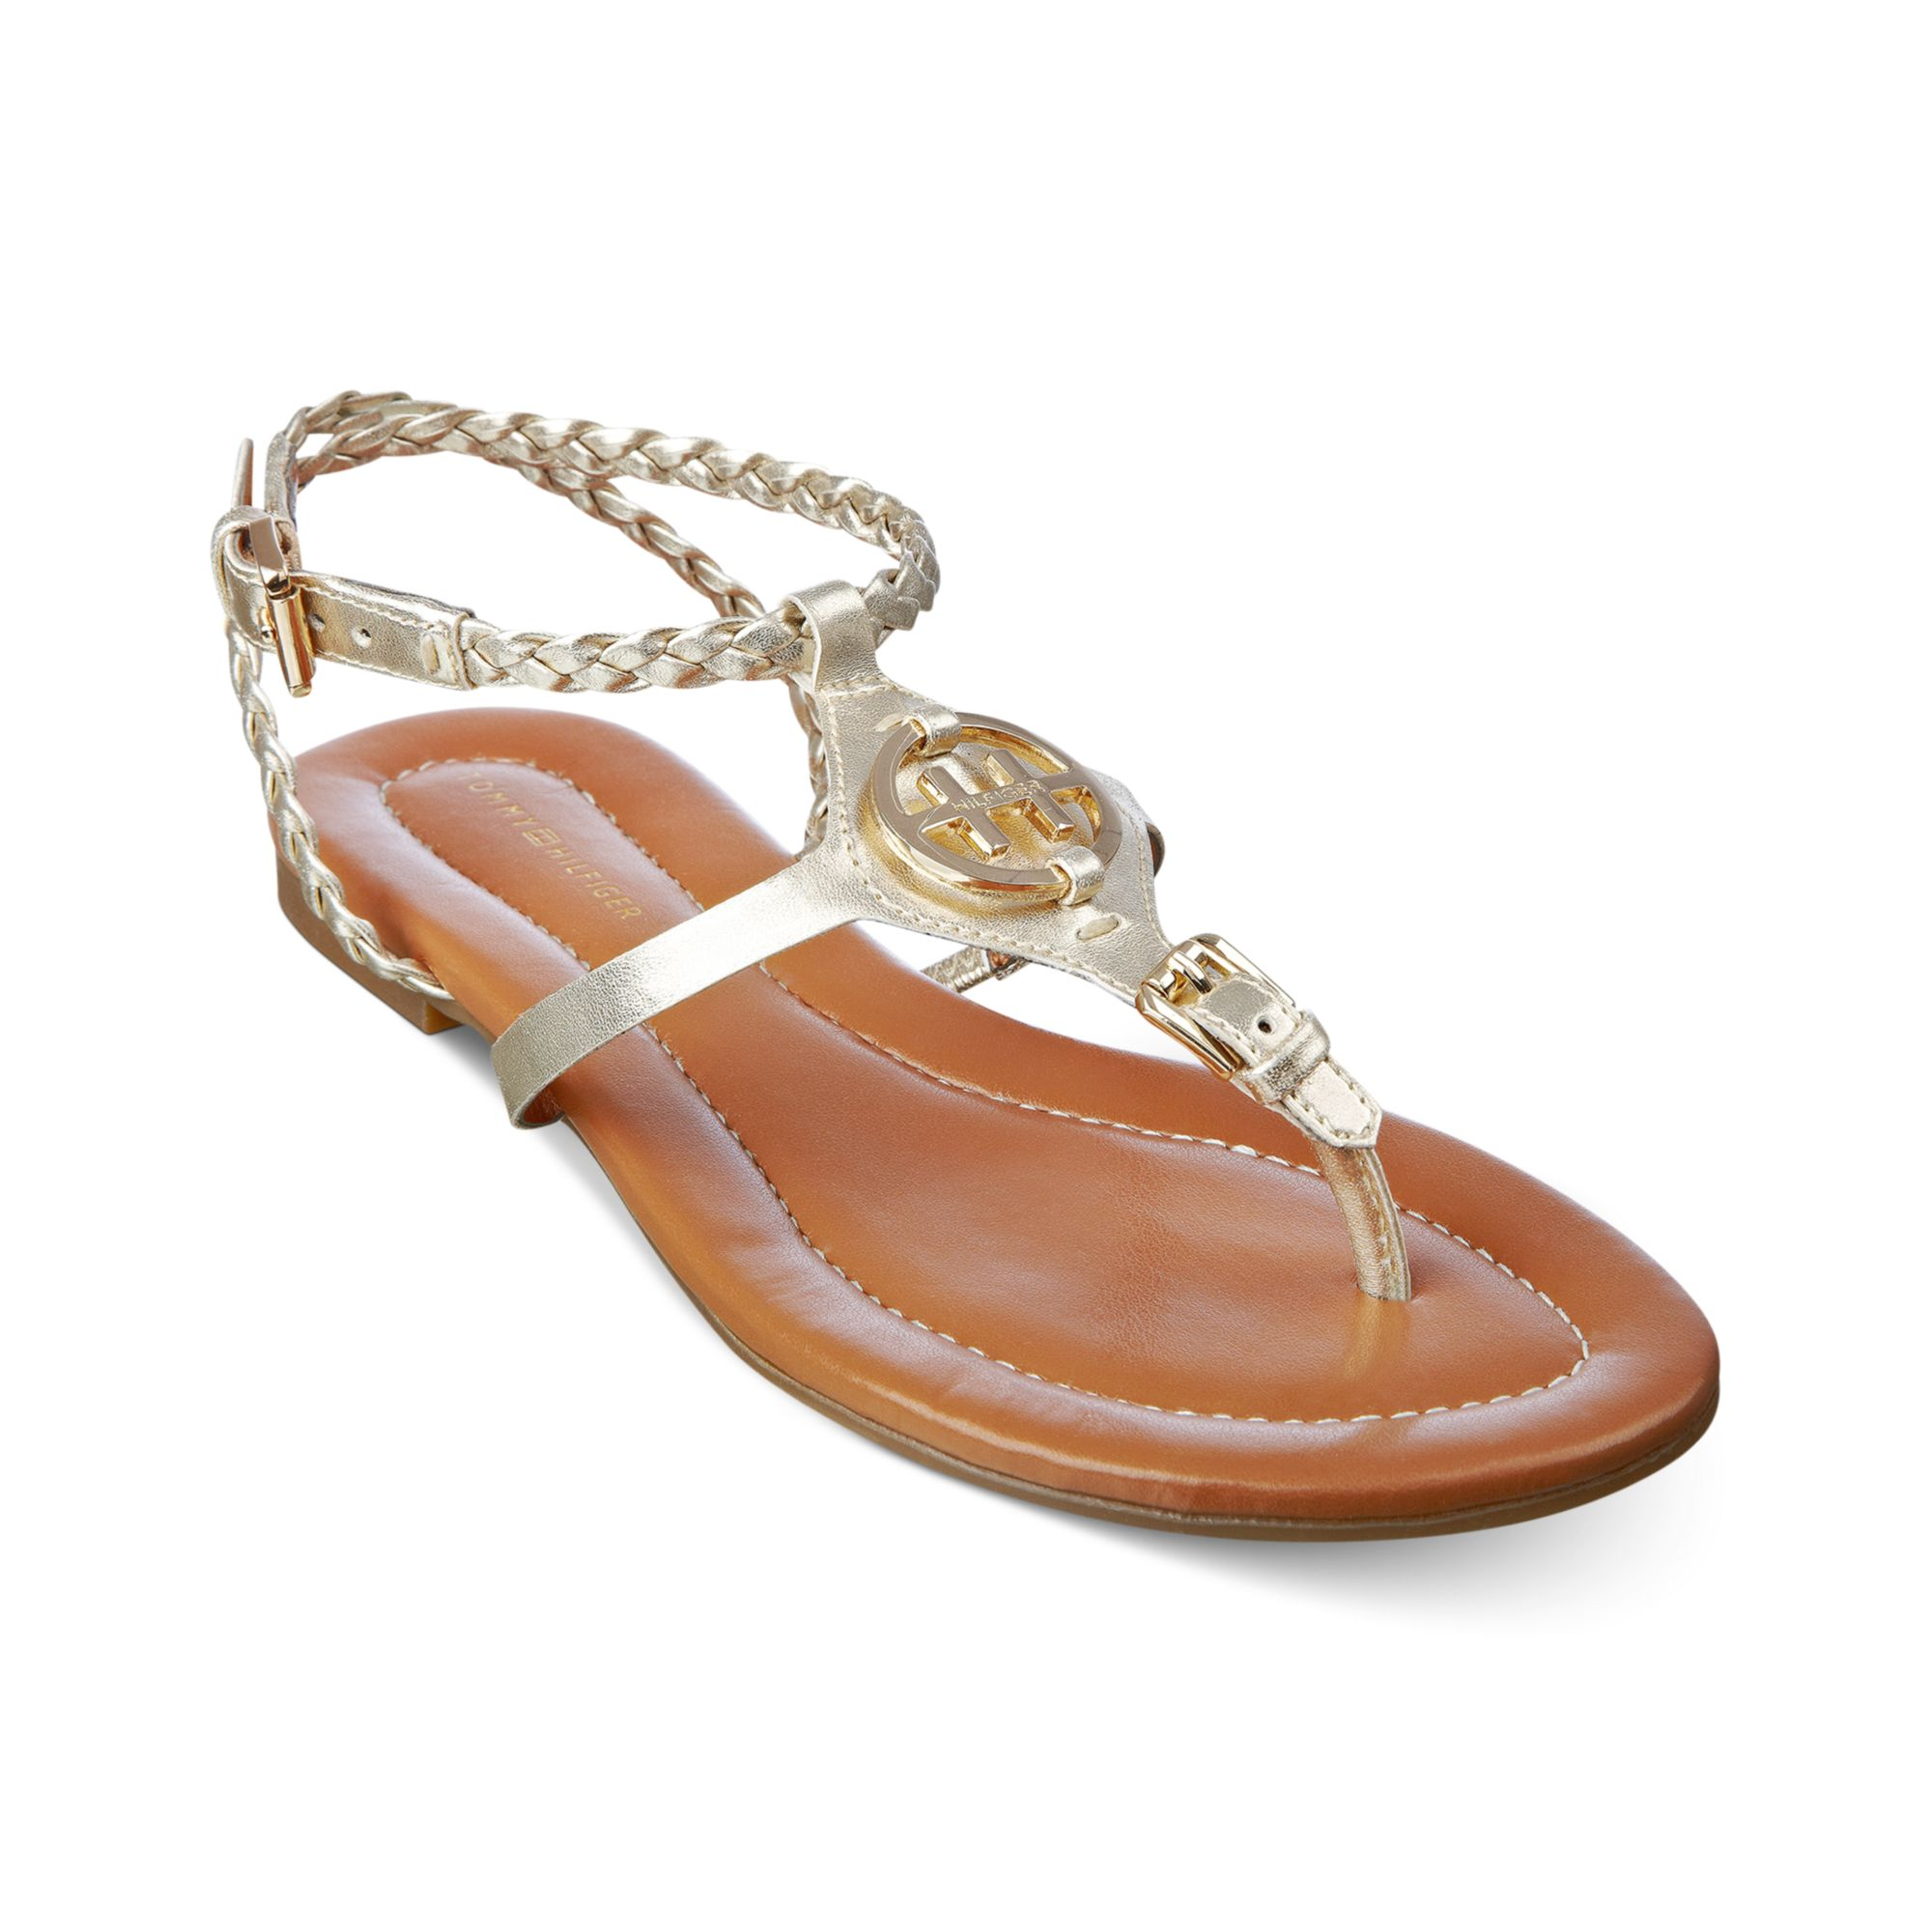 ab7638cfee38e Lyst - Tommy Hilfiger Strom Flat Sandals in Metallic